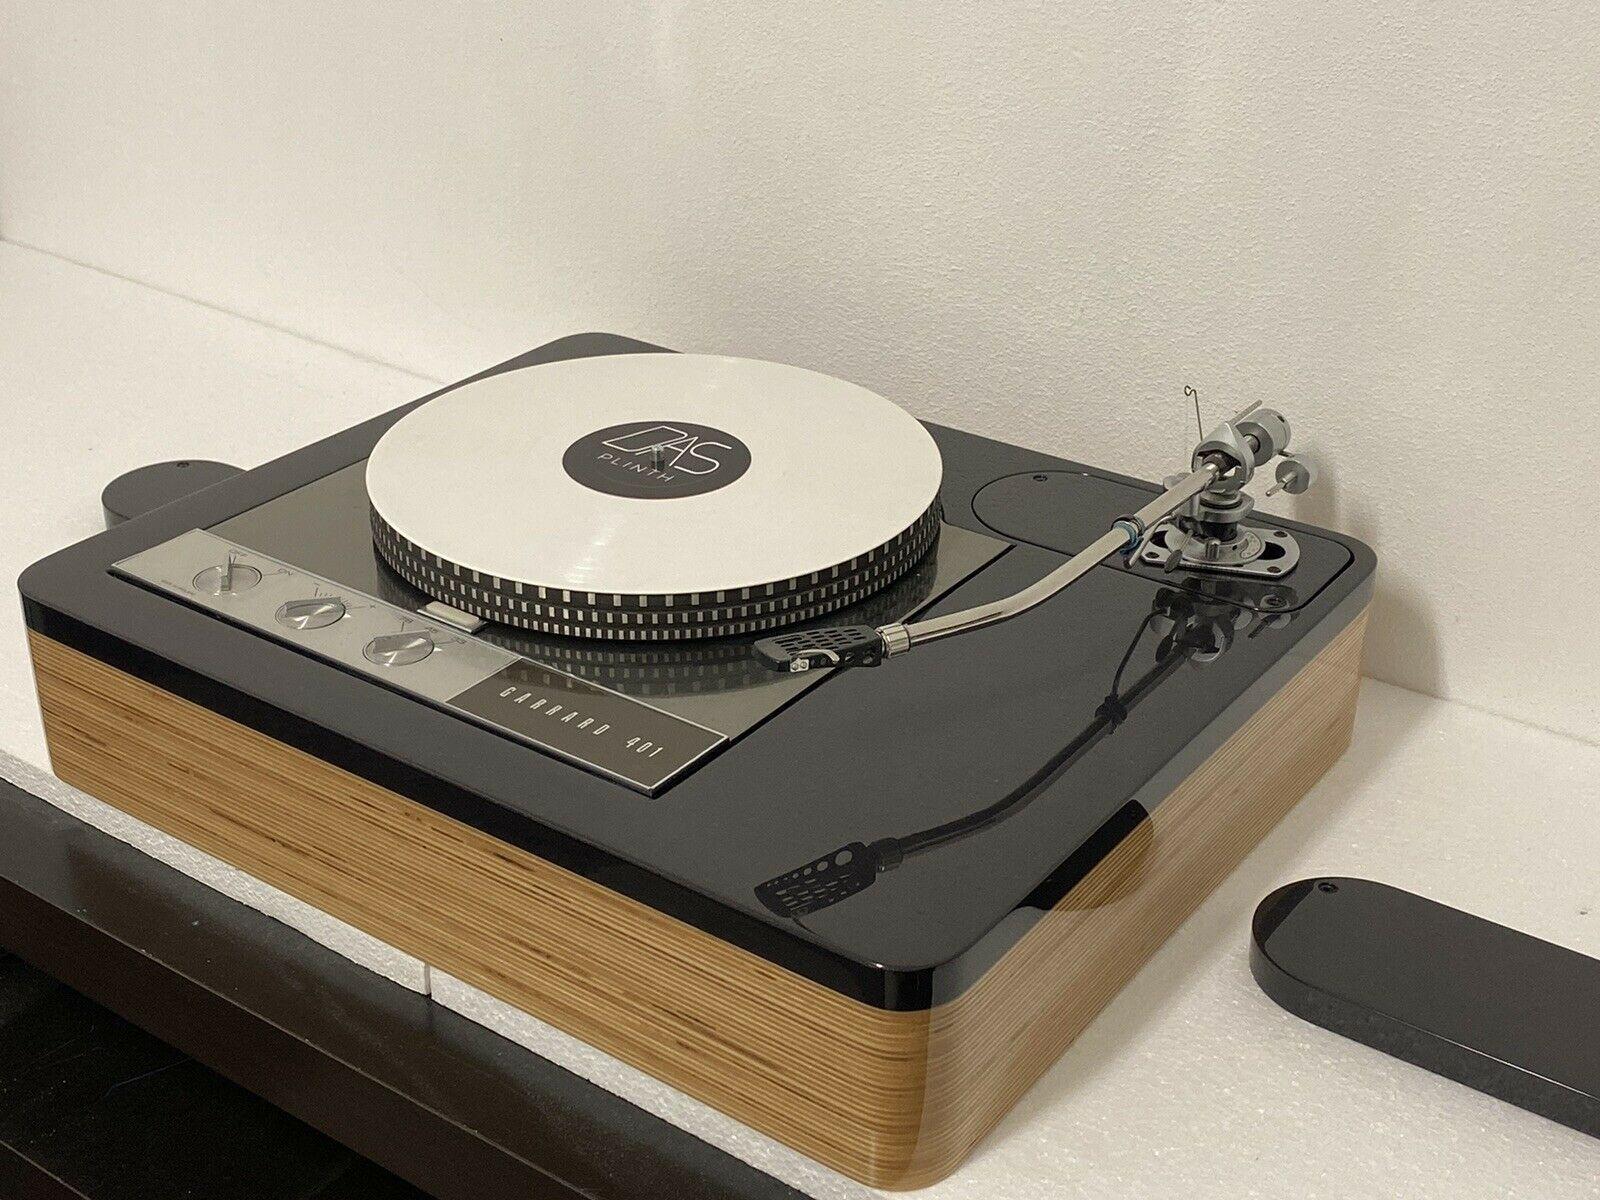 Lacquert Hq Birch Plywood Black Mdf Garrard 401 Long Version 9 12 Plinth Ebay In 2020 Turntable Record Player Record Players Vinyl Player